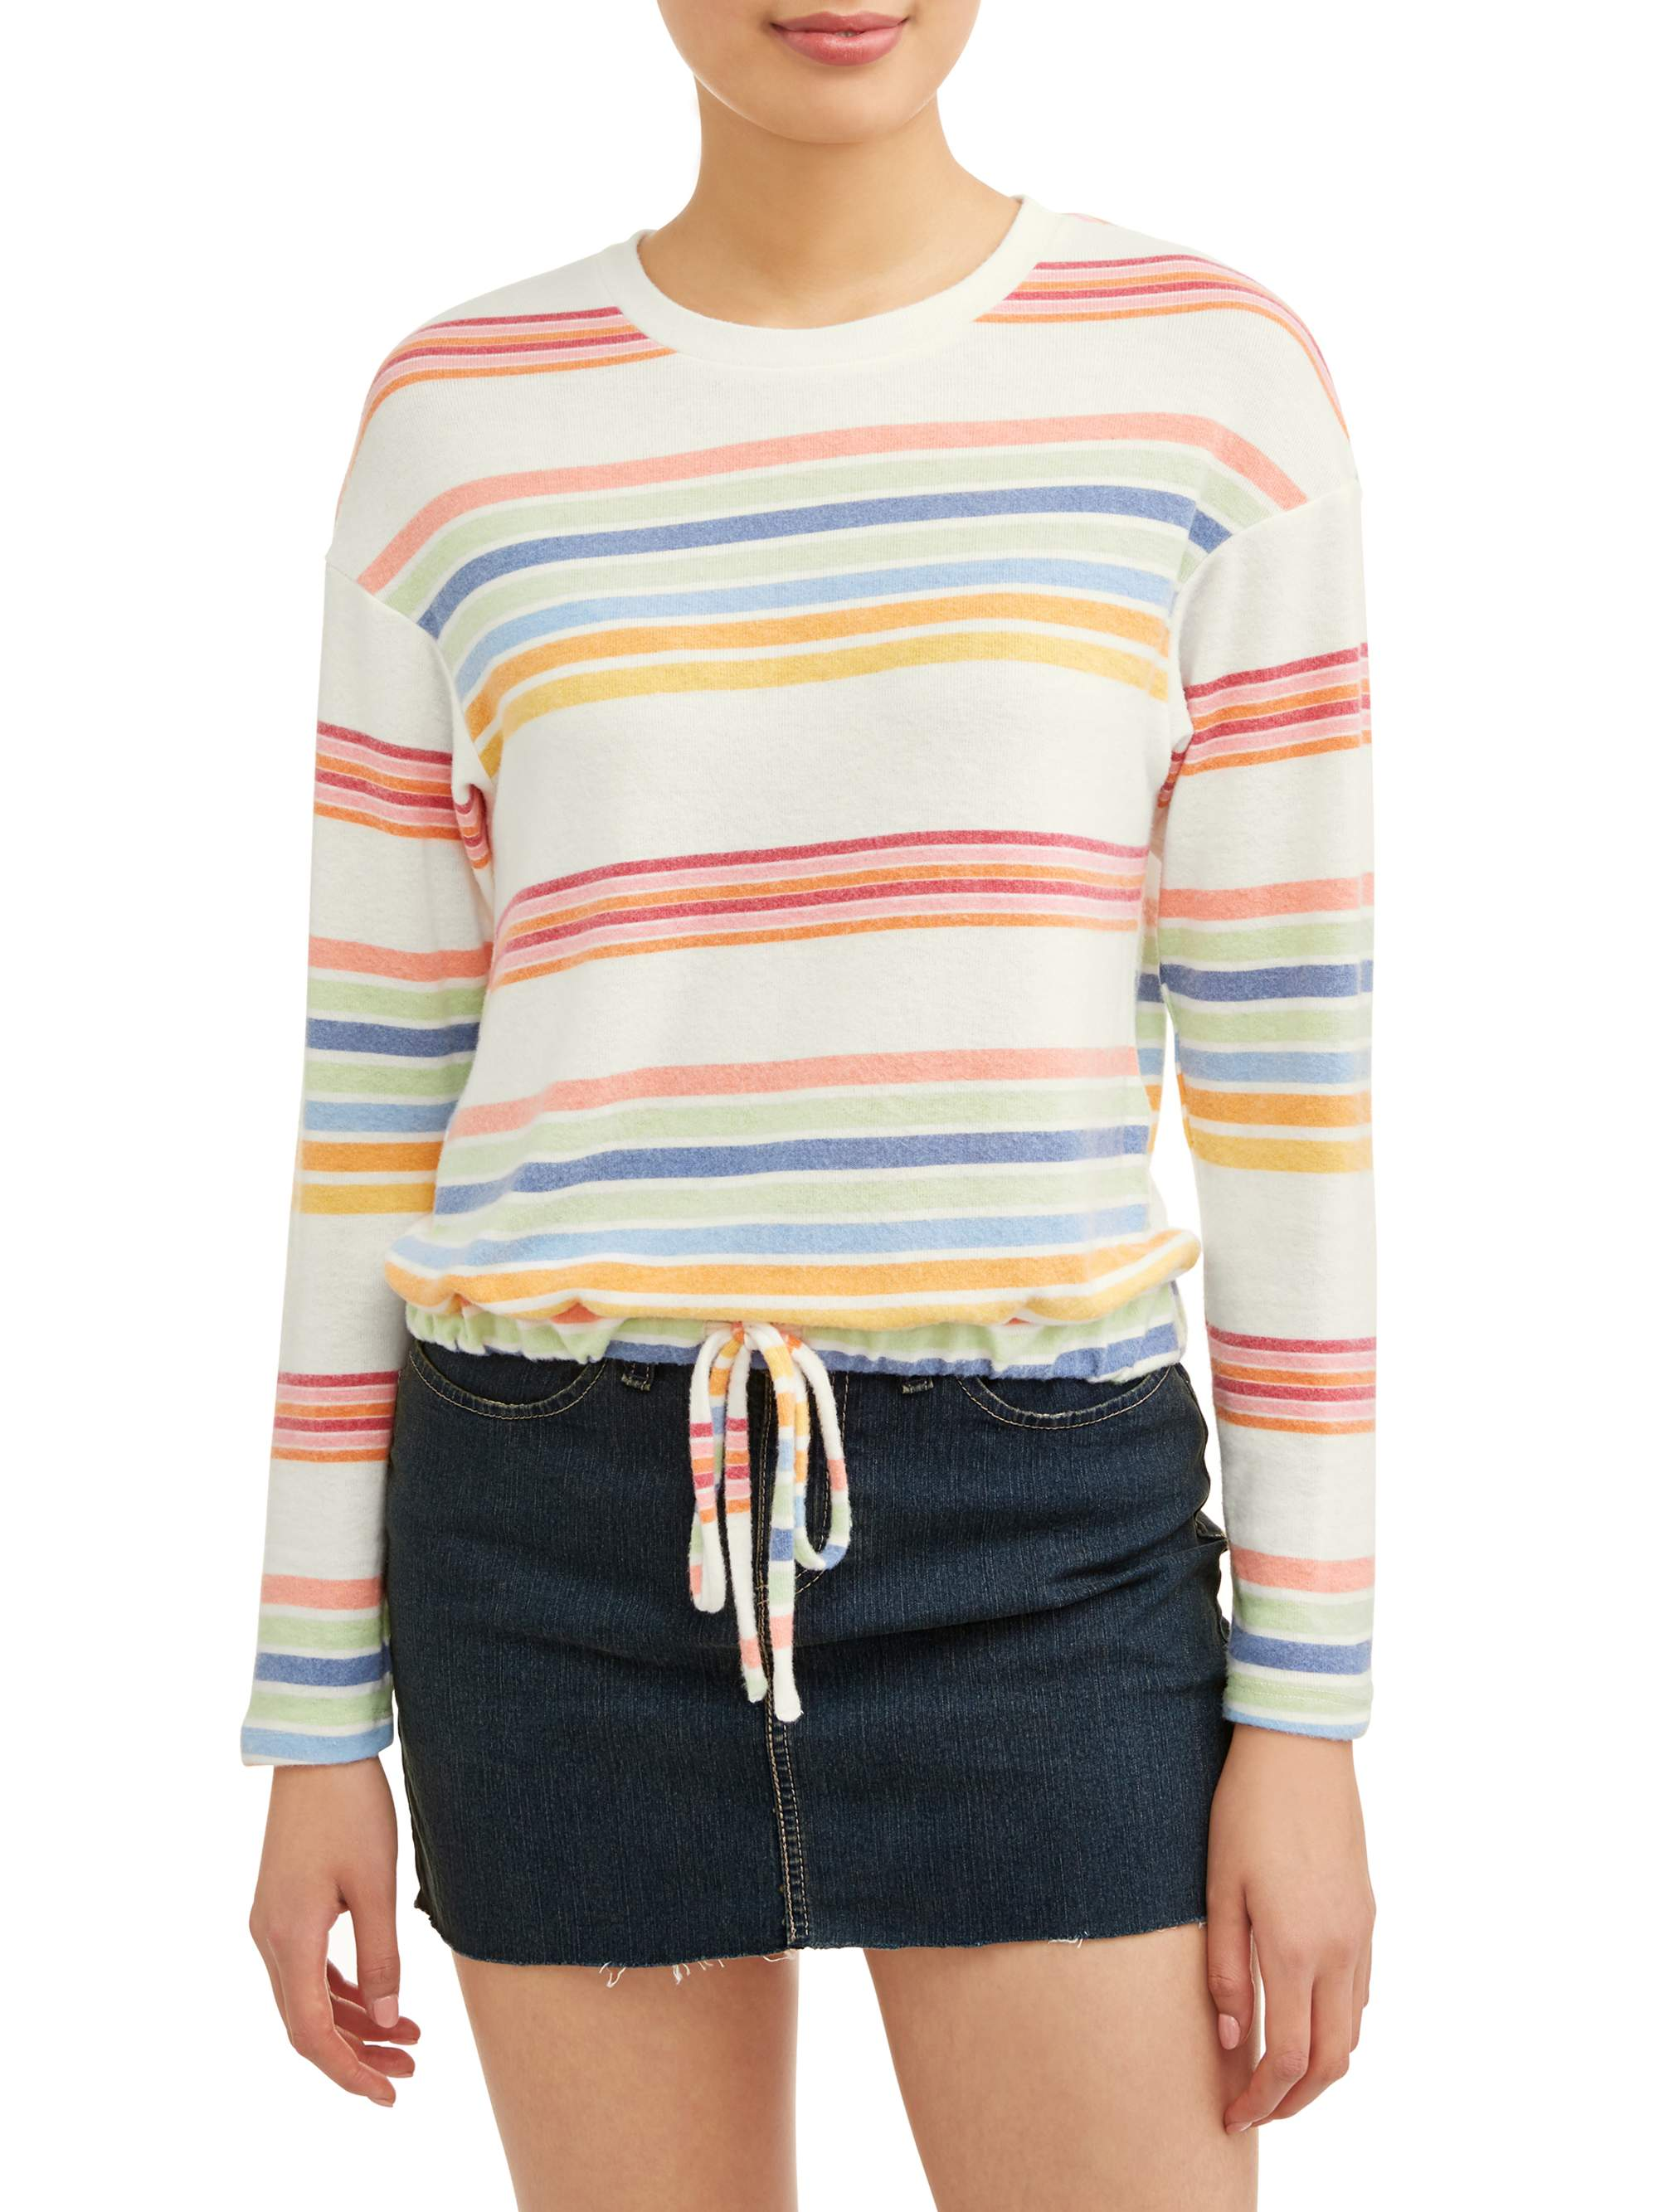 e12c896bb27 Amazon.com: black and white striped shirt juniors